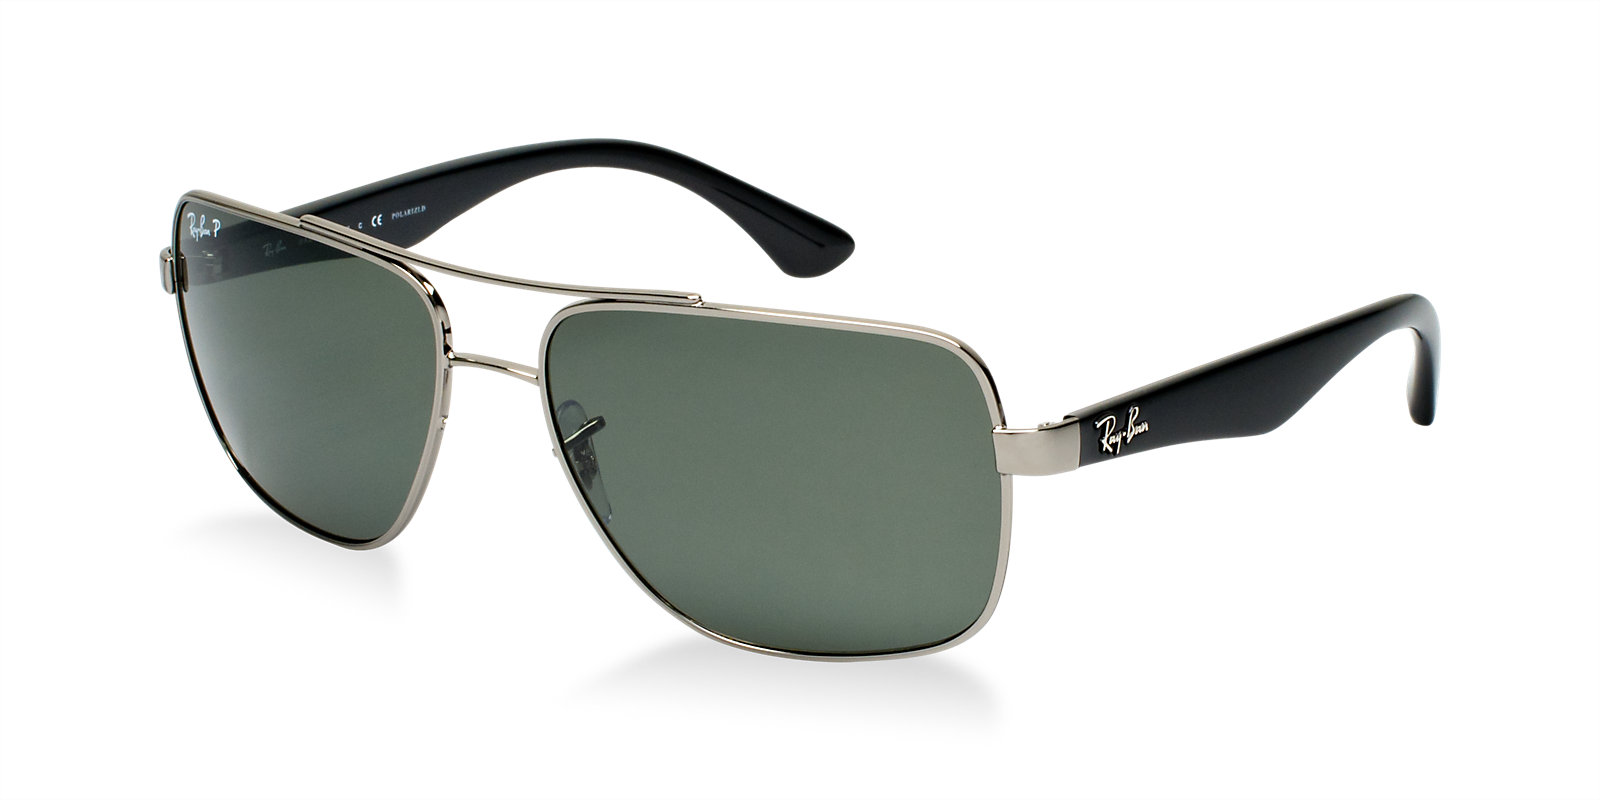 Ray Ban Rb3483 004 58 Gunmetal Polarized Sunglasses Lux Eyewear